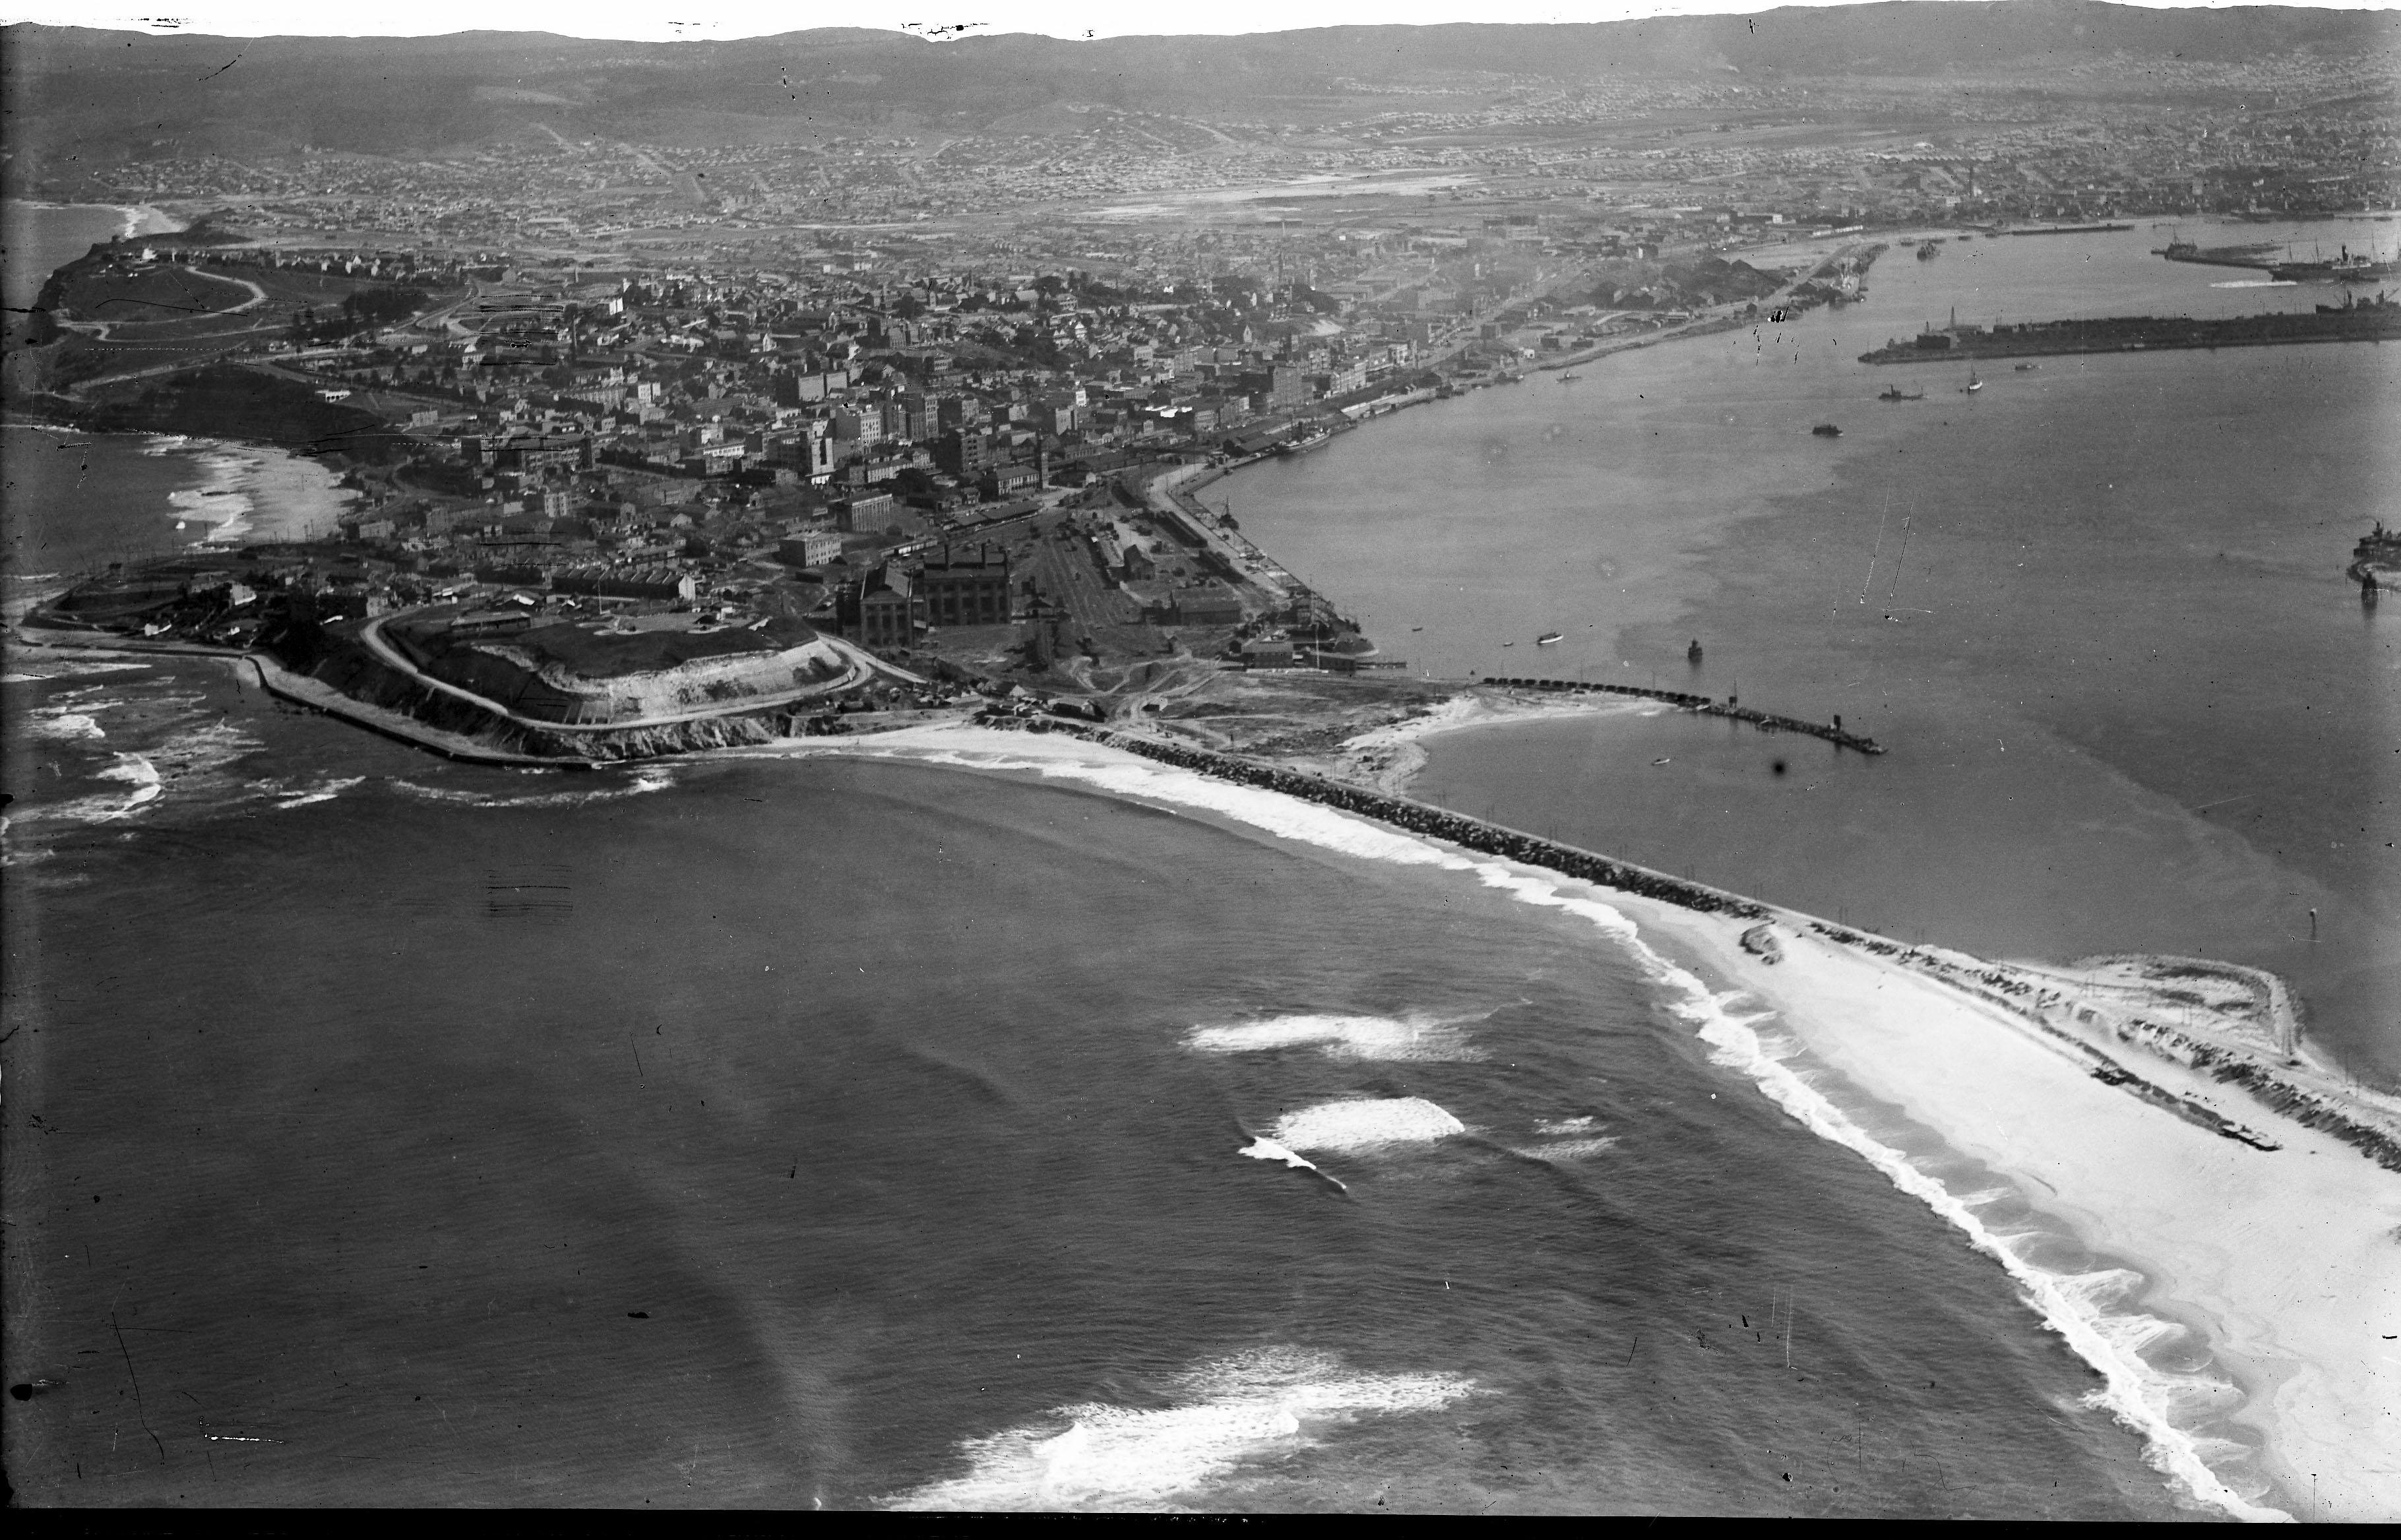 Newcastle aerial, 1935 (Image 66 Courtesy of Phillip Warren)